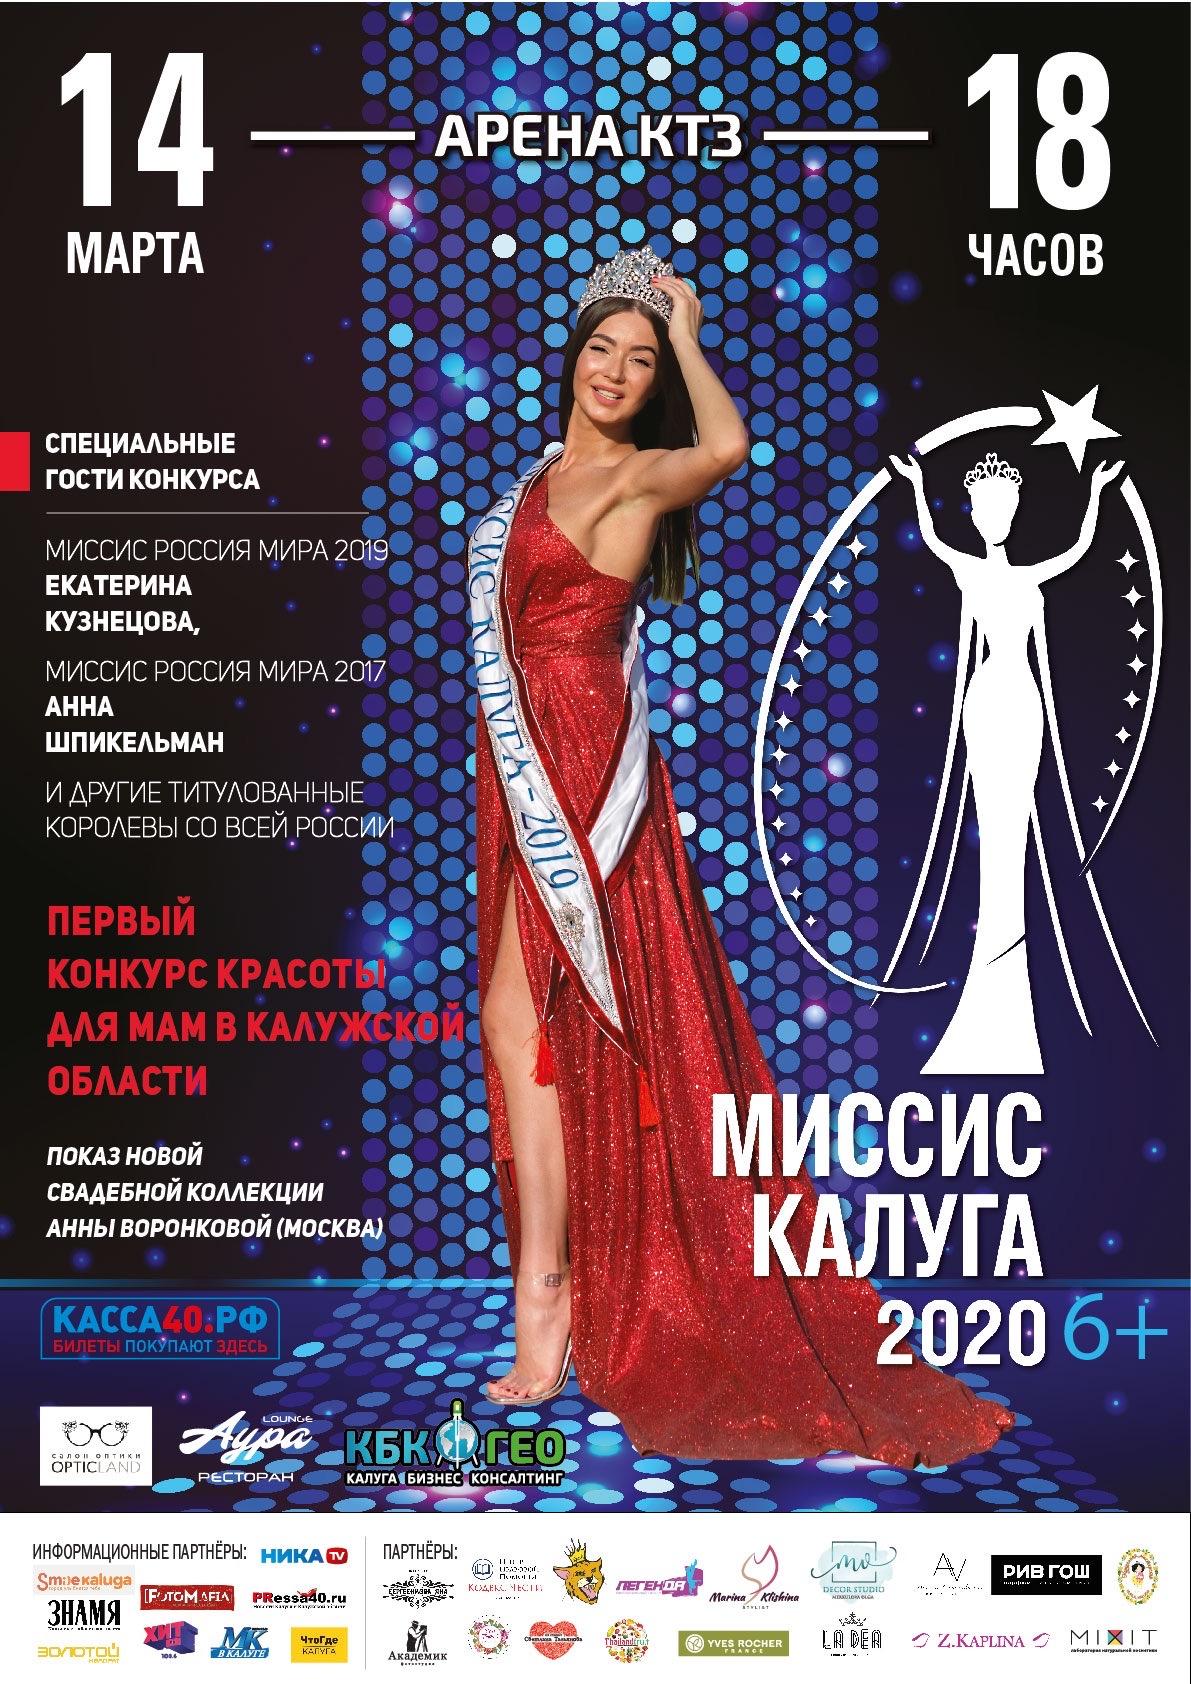 missis_kaluga_afisha_2020